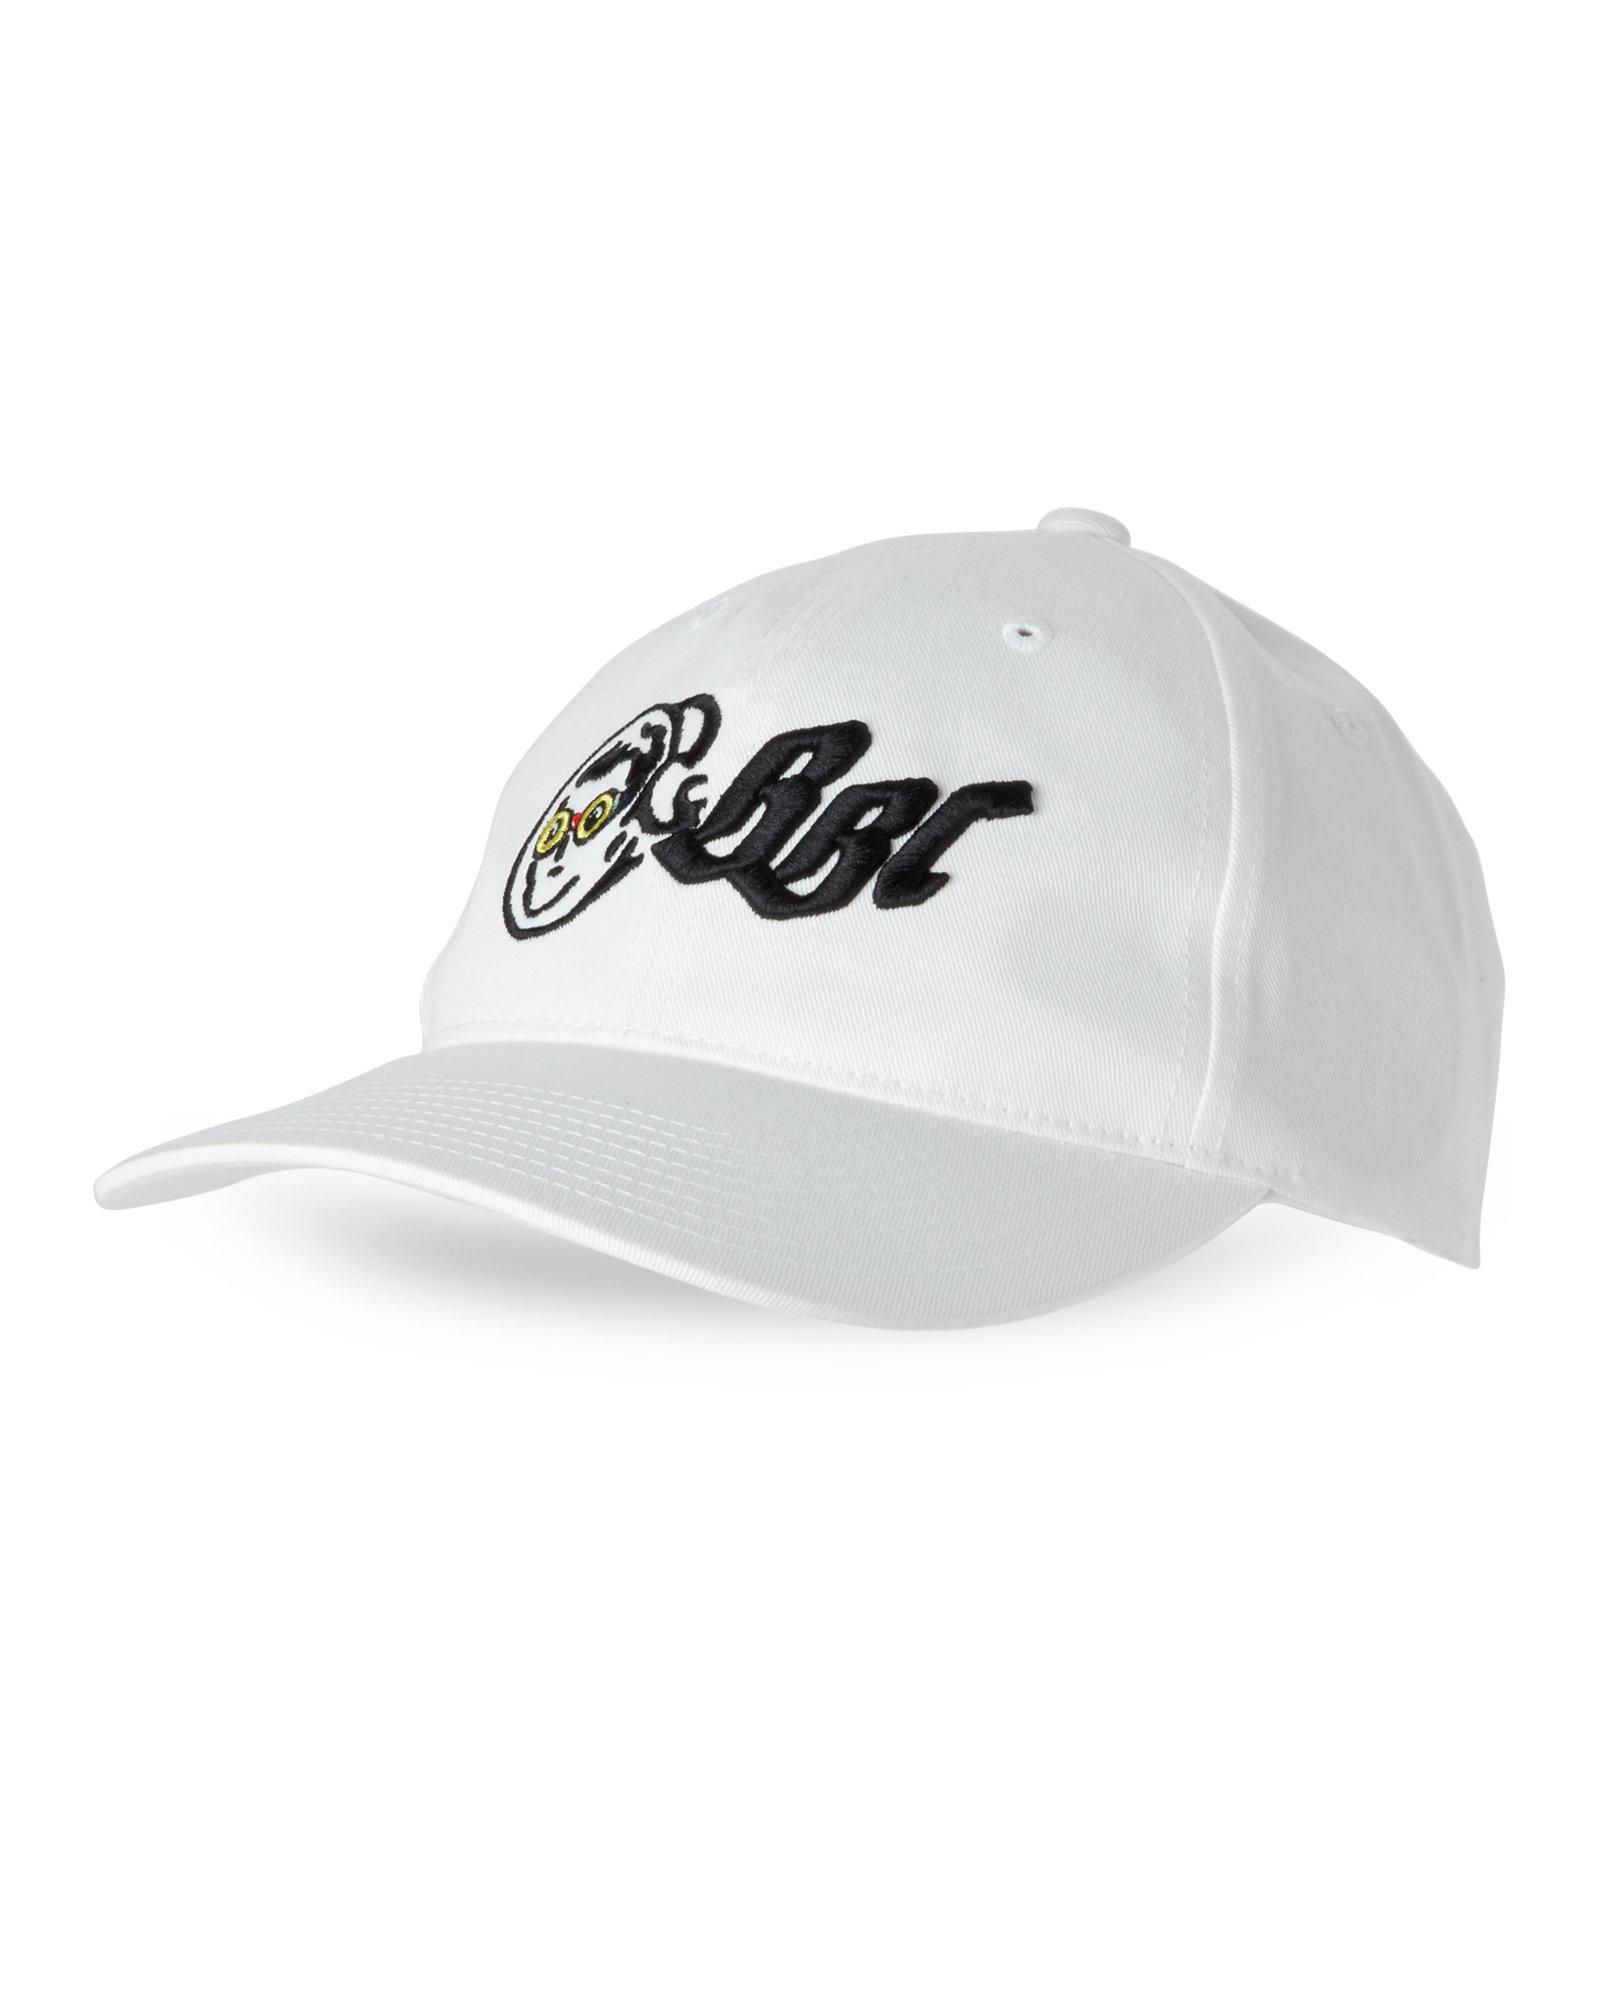 a3131bf4 BBCICECREAM Og Goggle Dad Hat in White for Men - Lyst